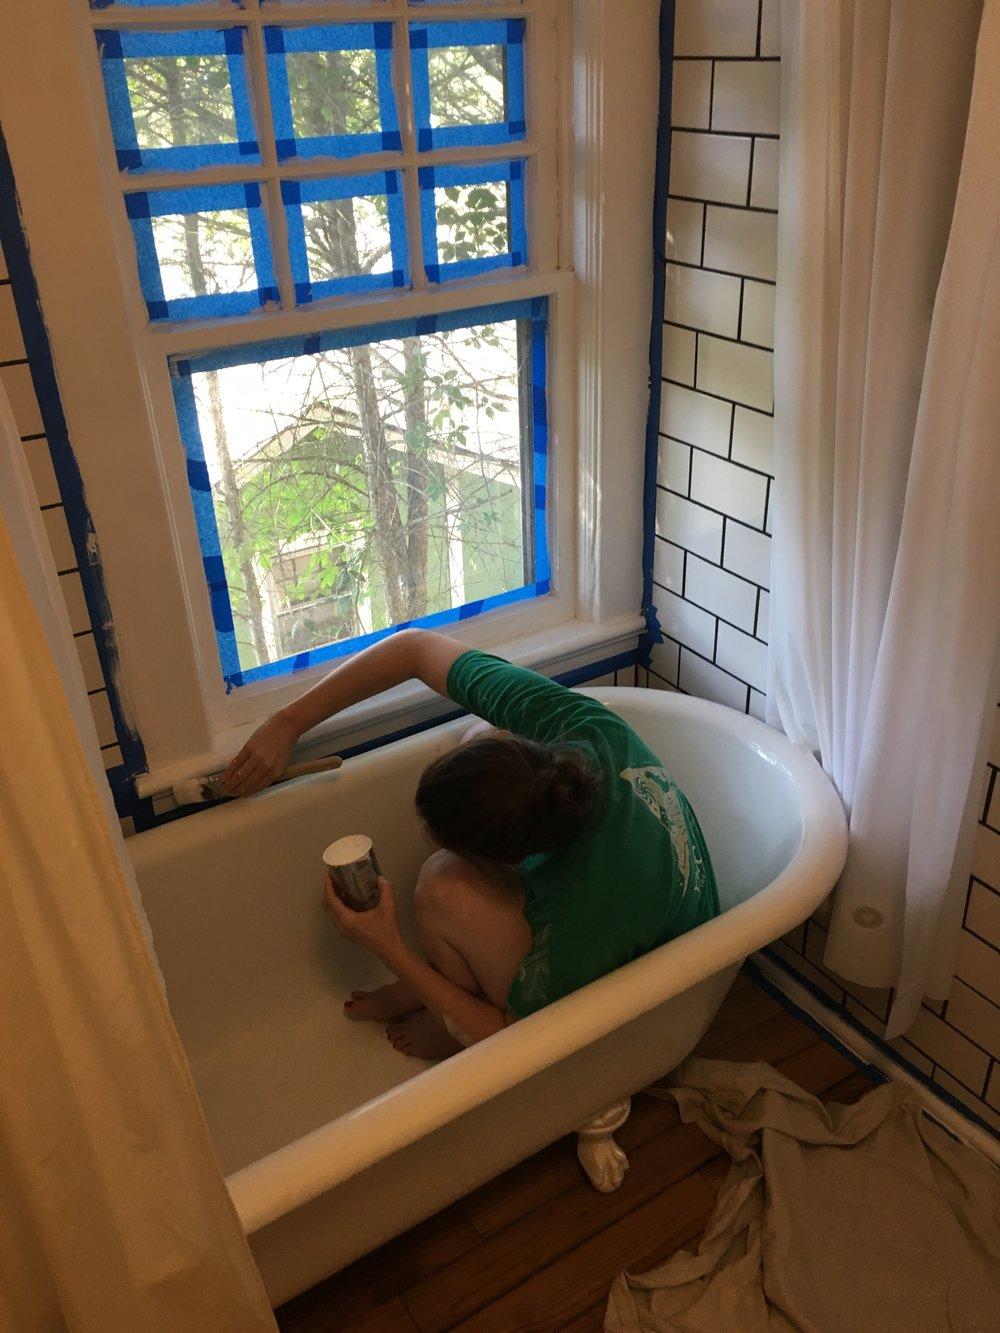 Bathroom-painting-project-idea